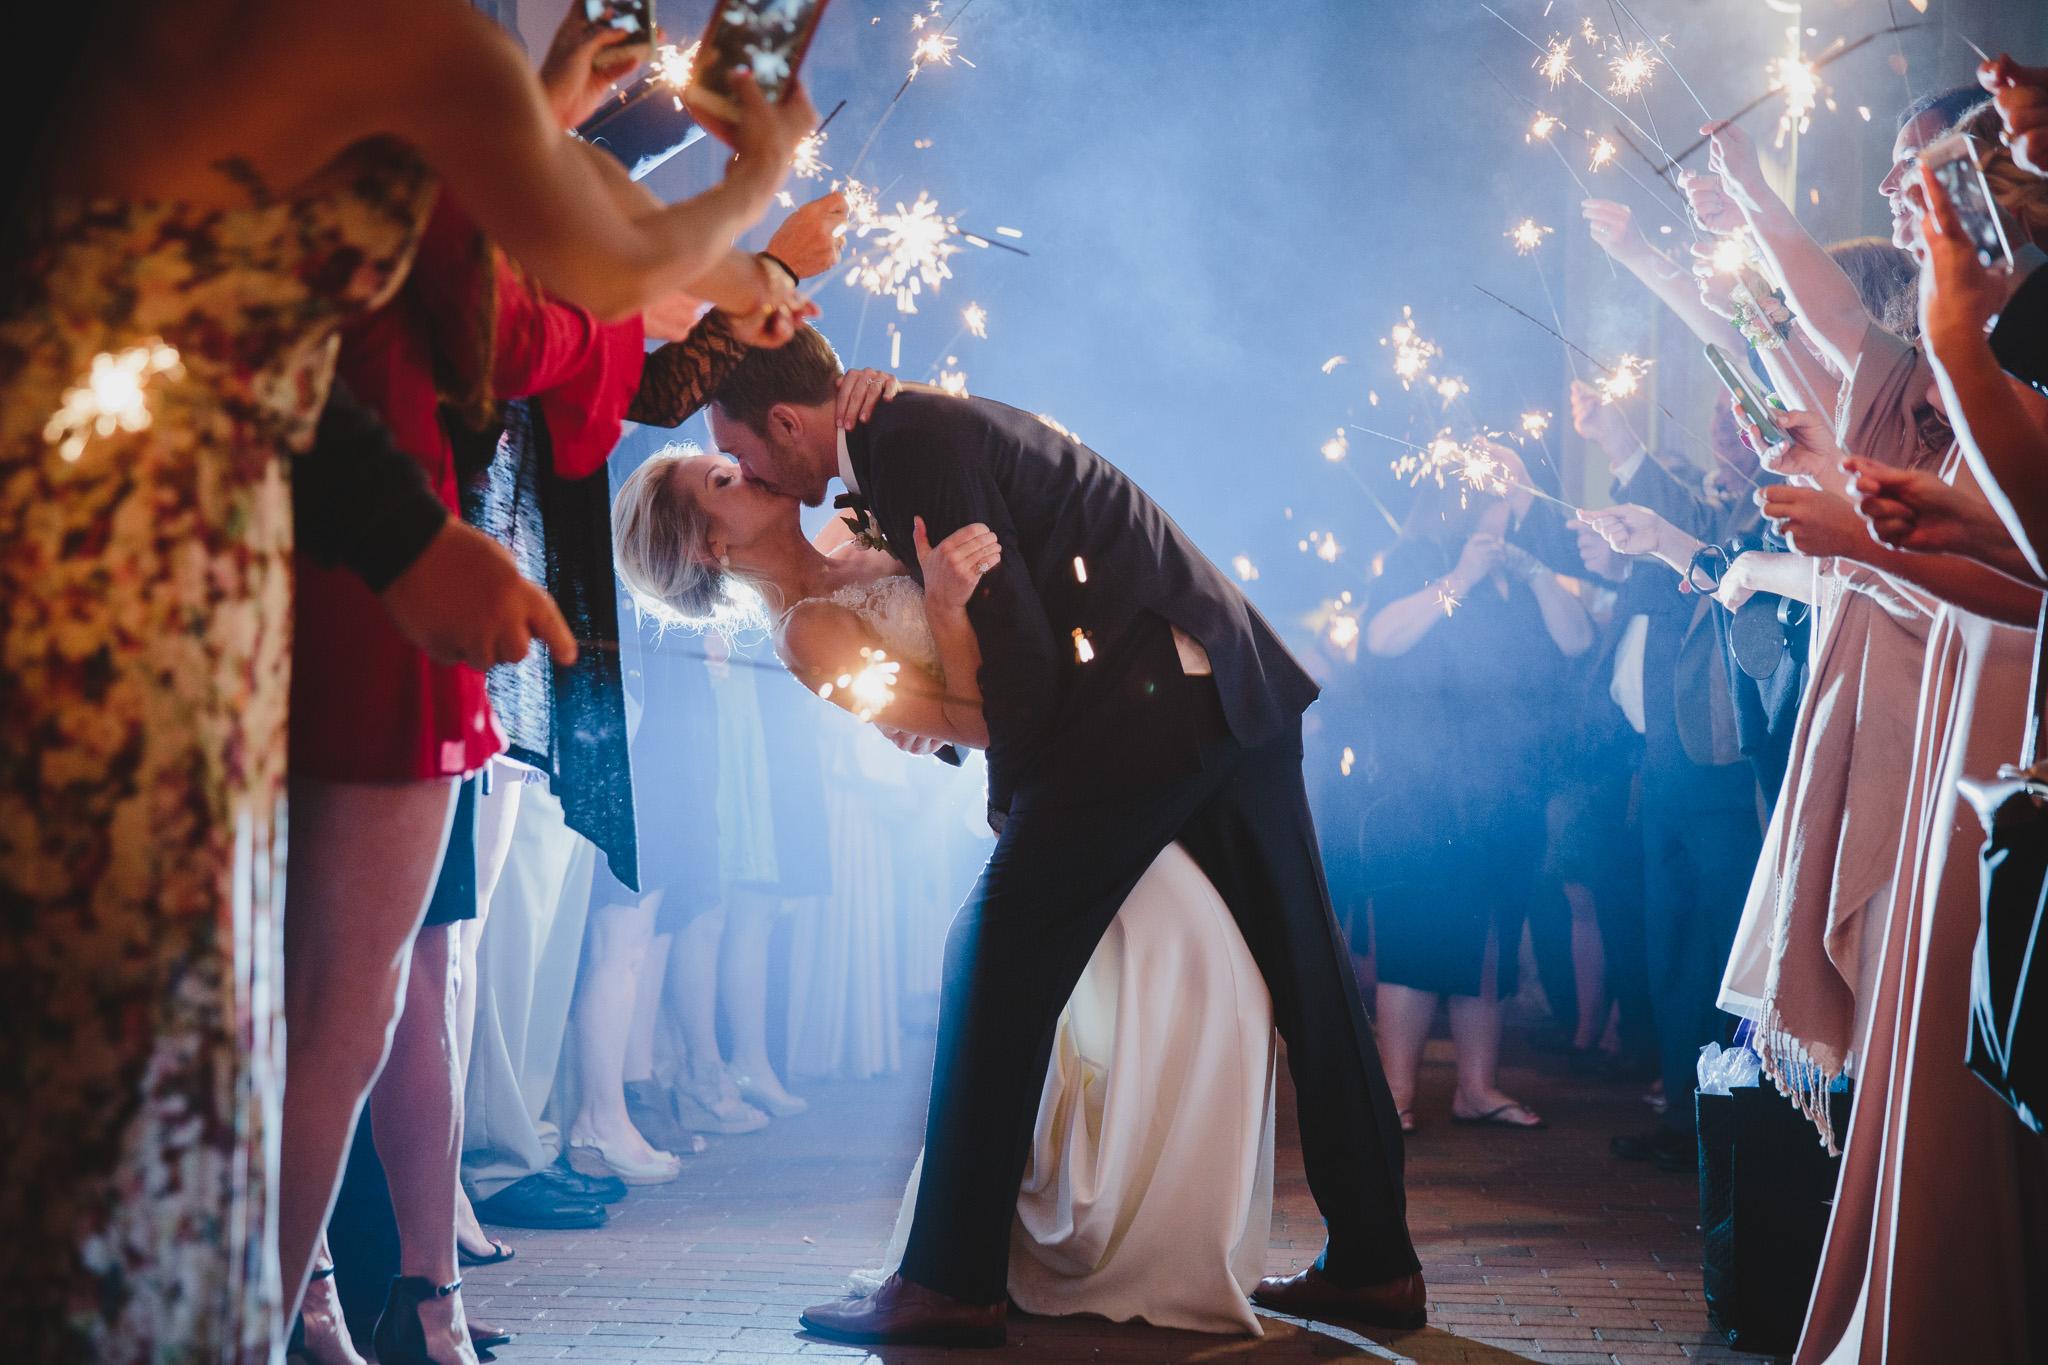 white-room-st-augustine-wedding-venue-grand-sparkler-exit